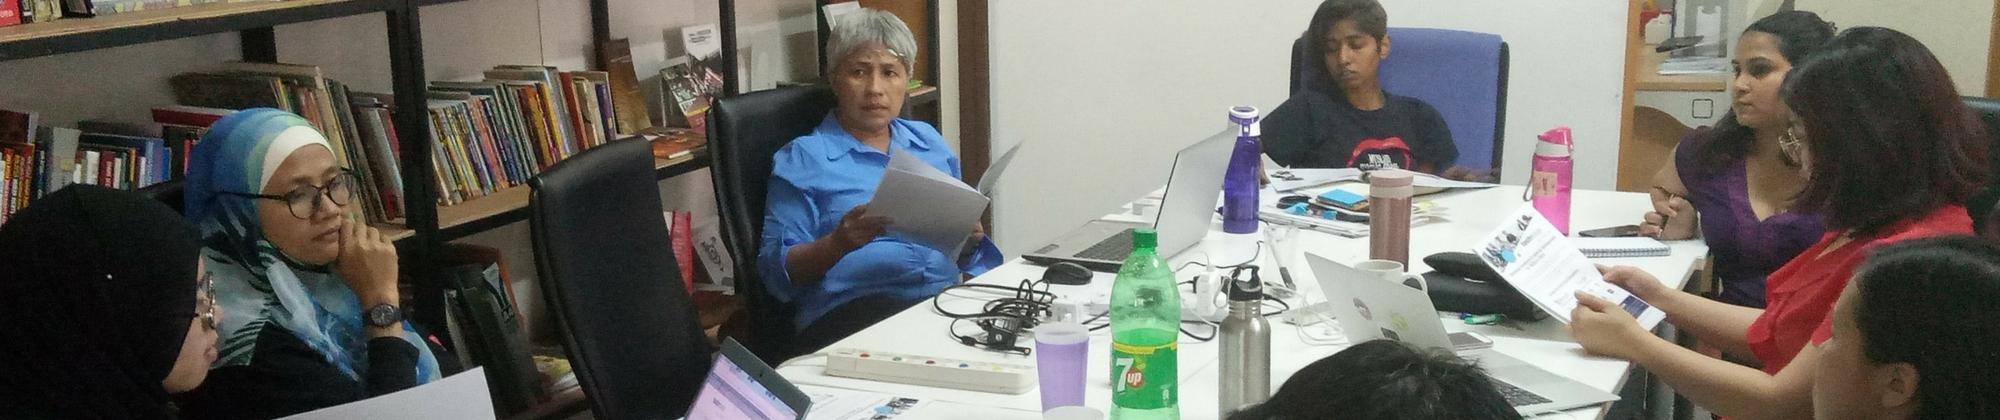 empowering-women-malaysia